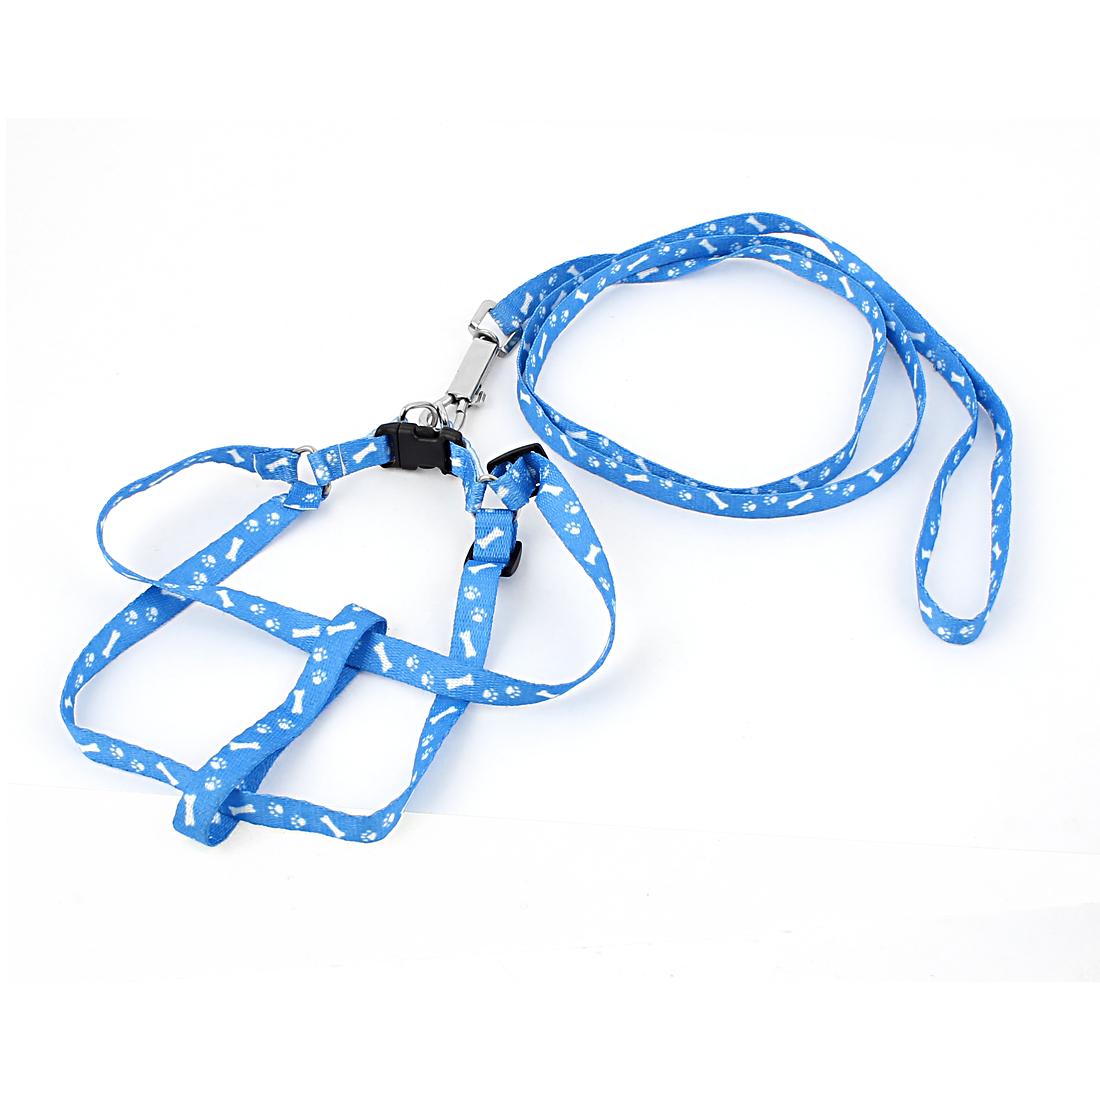 120cm 4ft Bone Paw Print Adjustable Pet Puppy Dog Harness Leash Blue